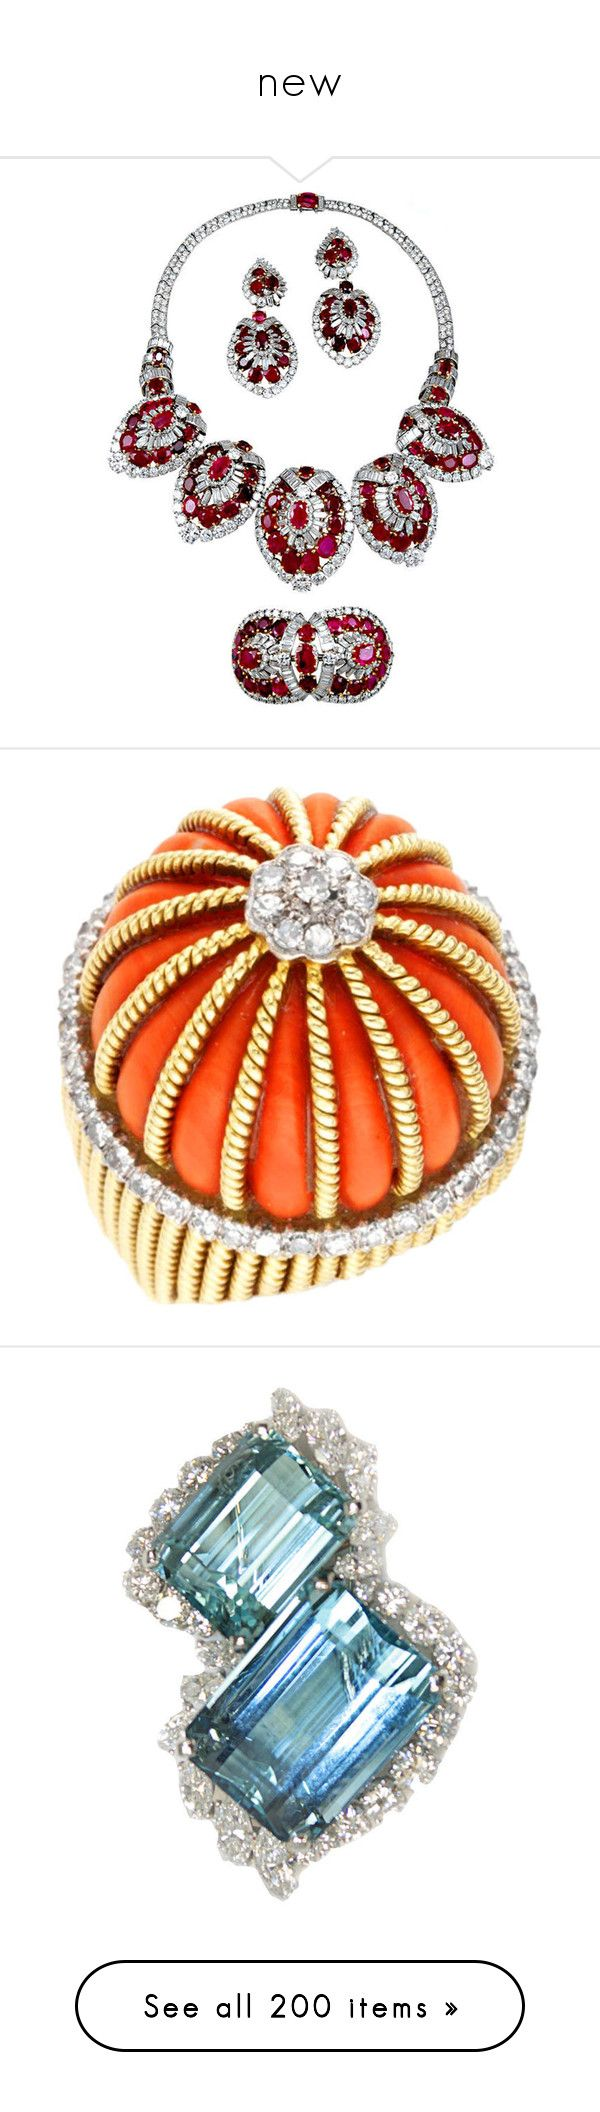 """new"" by biju-nicklace ❤ liked on Polyvore featuring jewelry, cartier jewelry, diamond jewellery, cartier jewellery, ruby jewellery, ruby jewelry, rings, diamond rings, coral ring and coral jewelry"